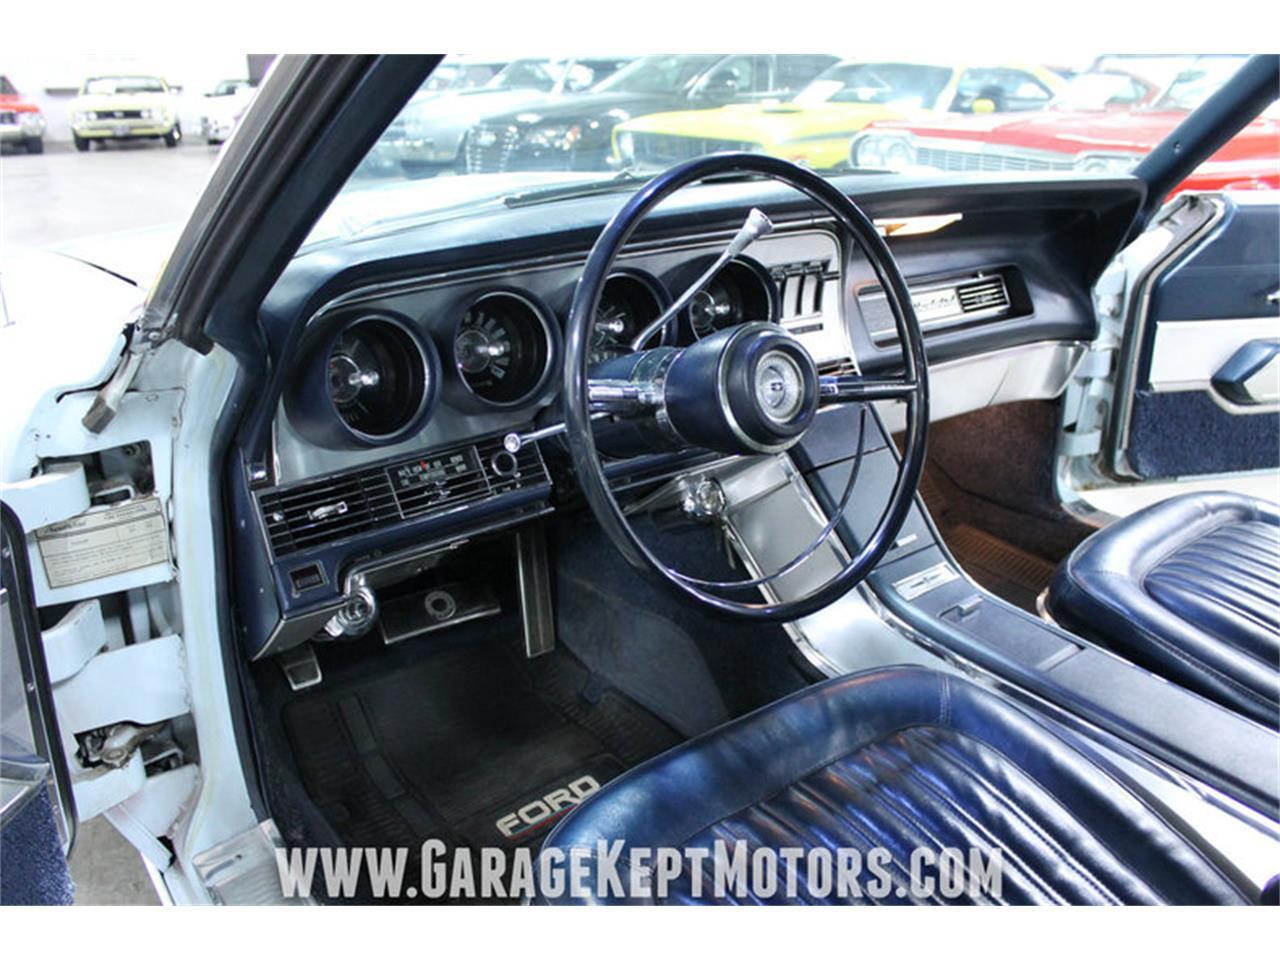 Large Picture of Classic '67 Thunderbird 2-Door Landau located in Grand Rapids Michigan Offered by Garage Kept Motors - LU7P